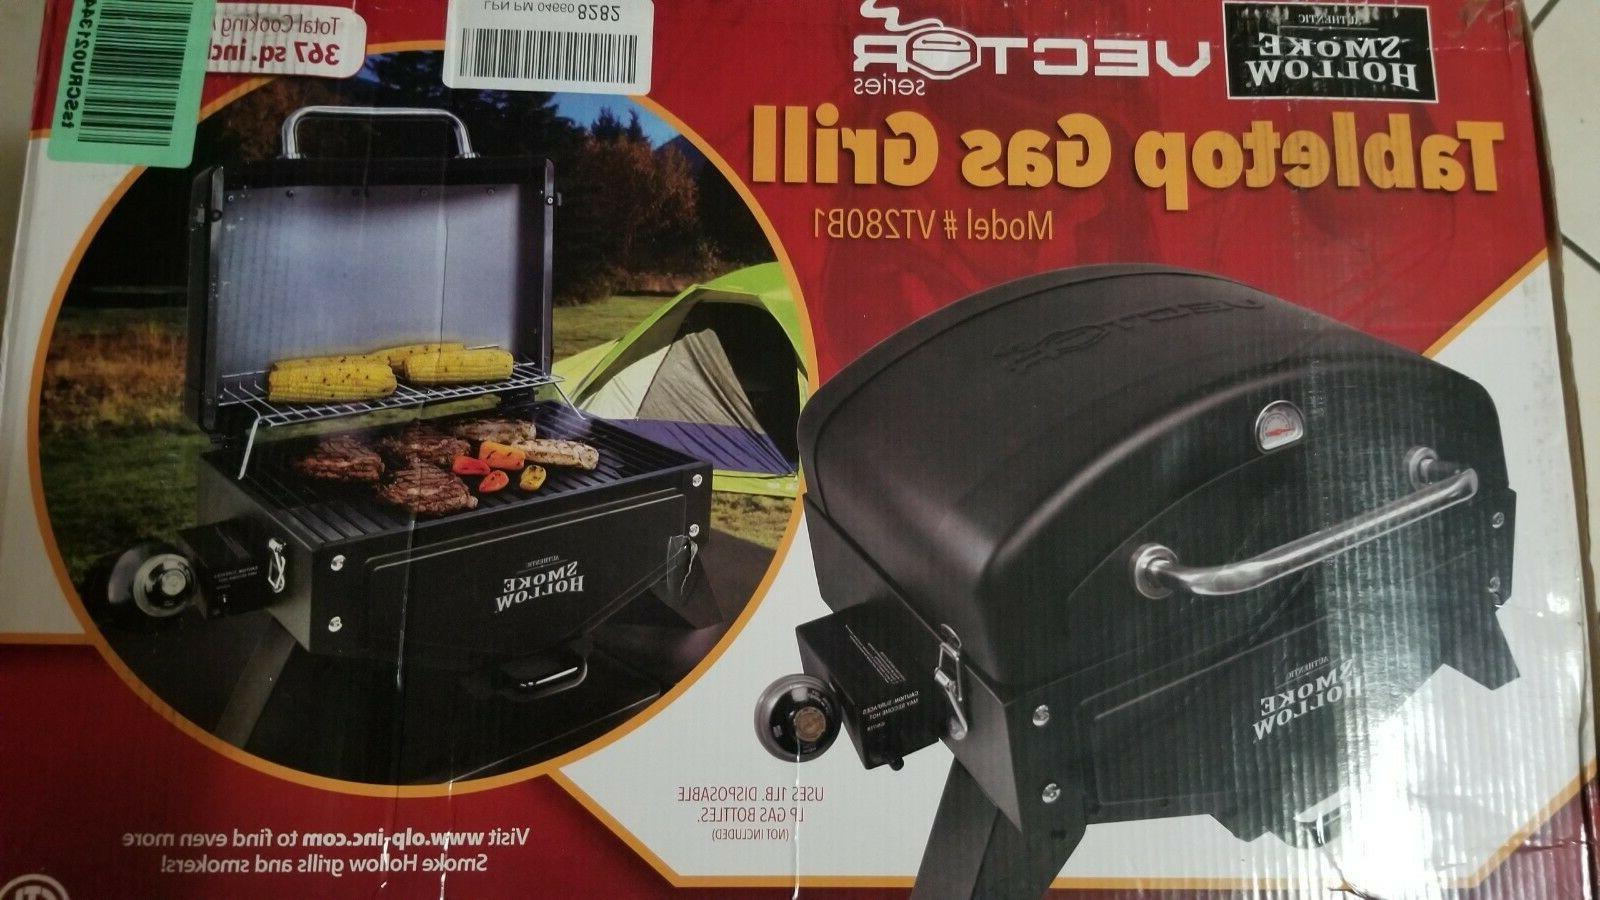 Smoke Tabletop Portable Grill